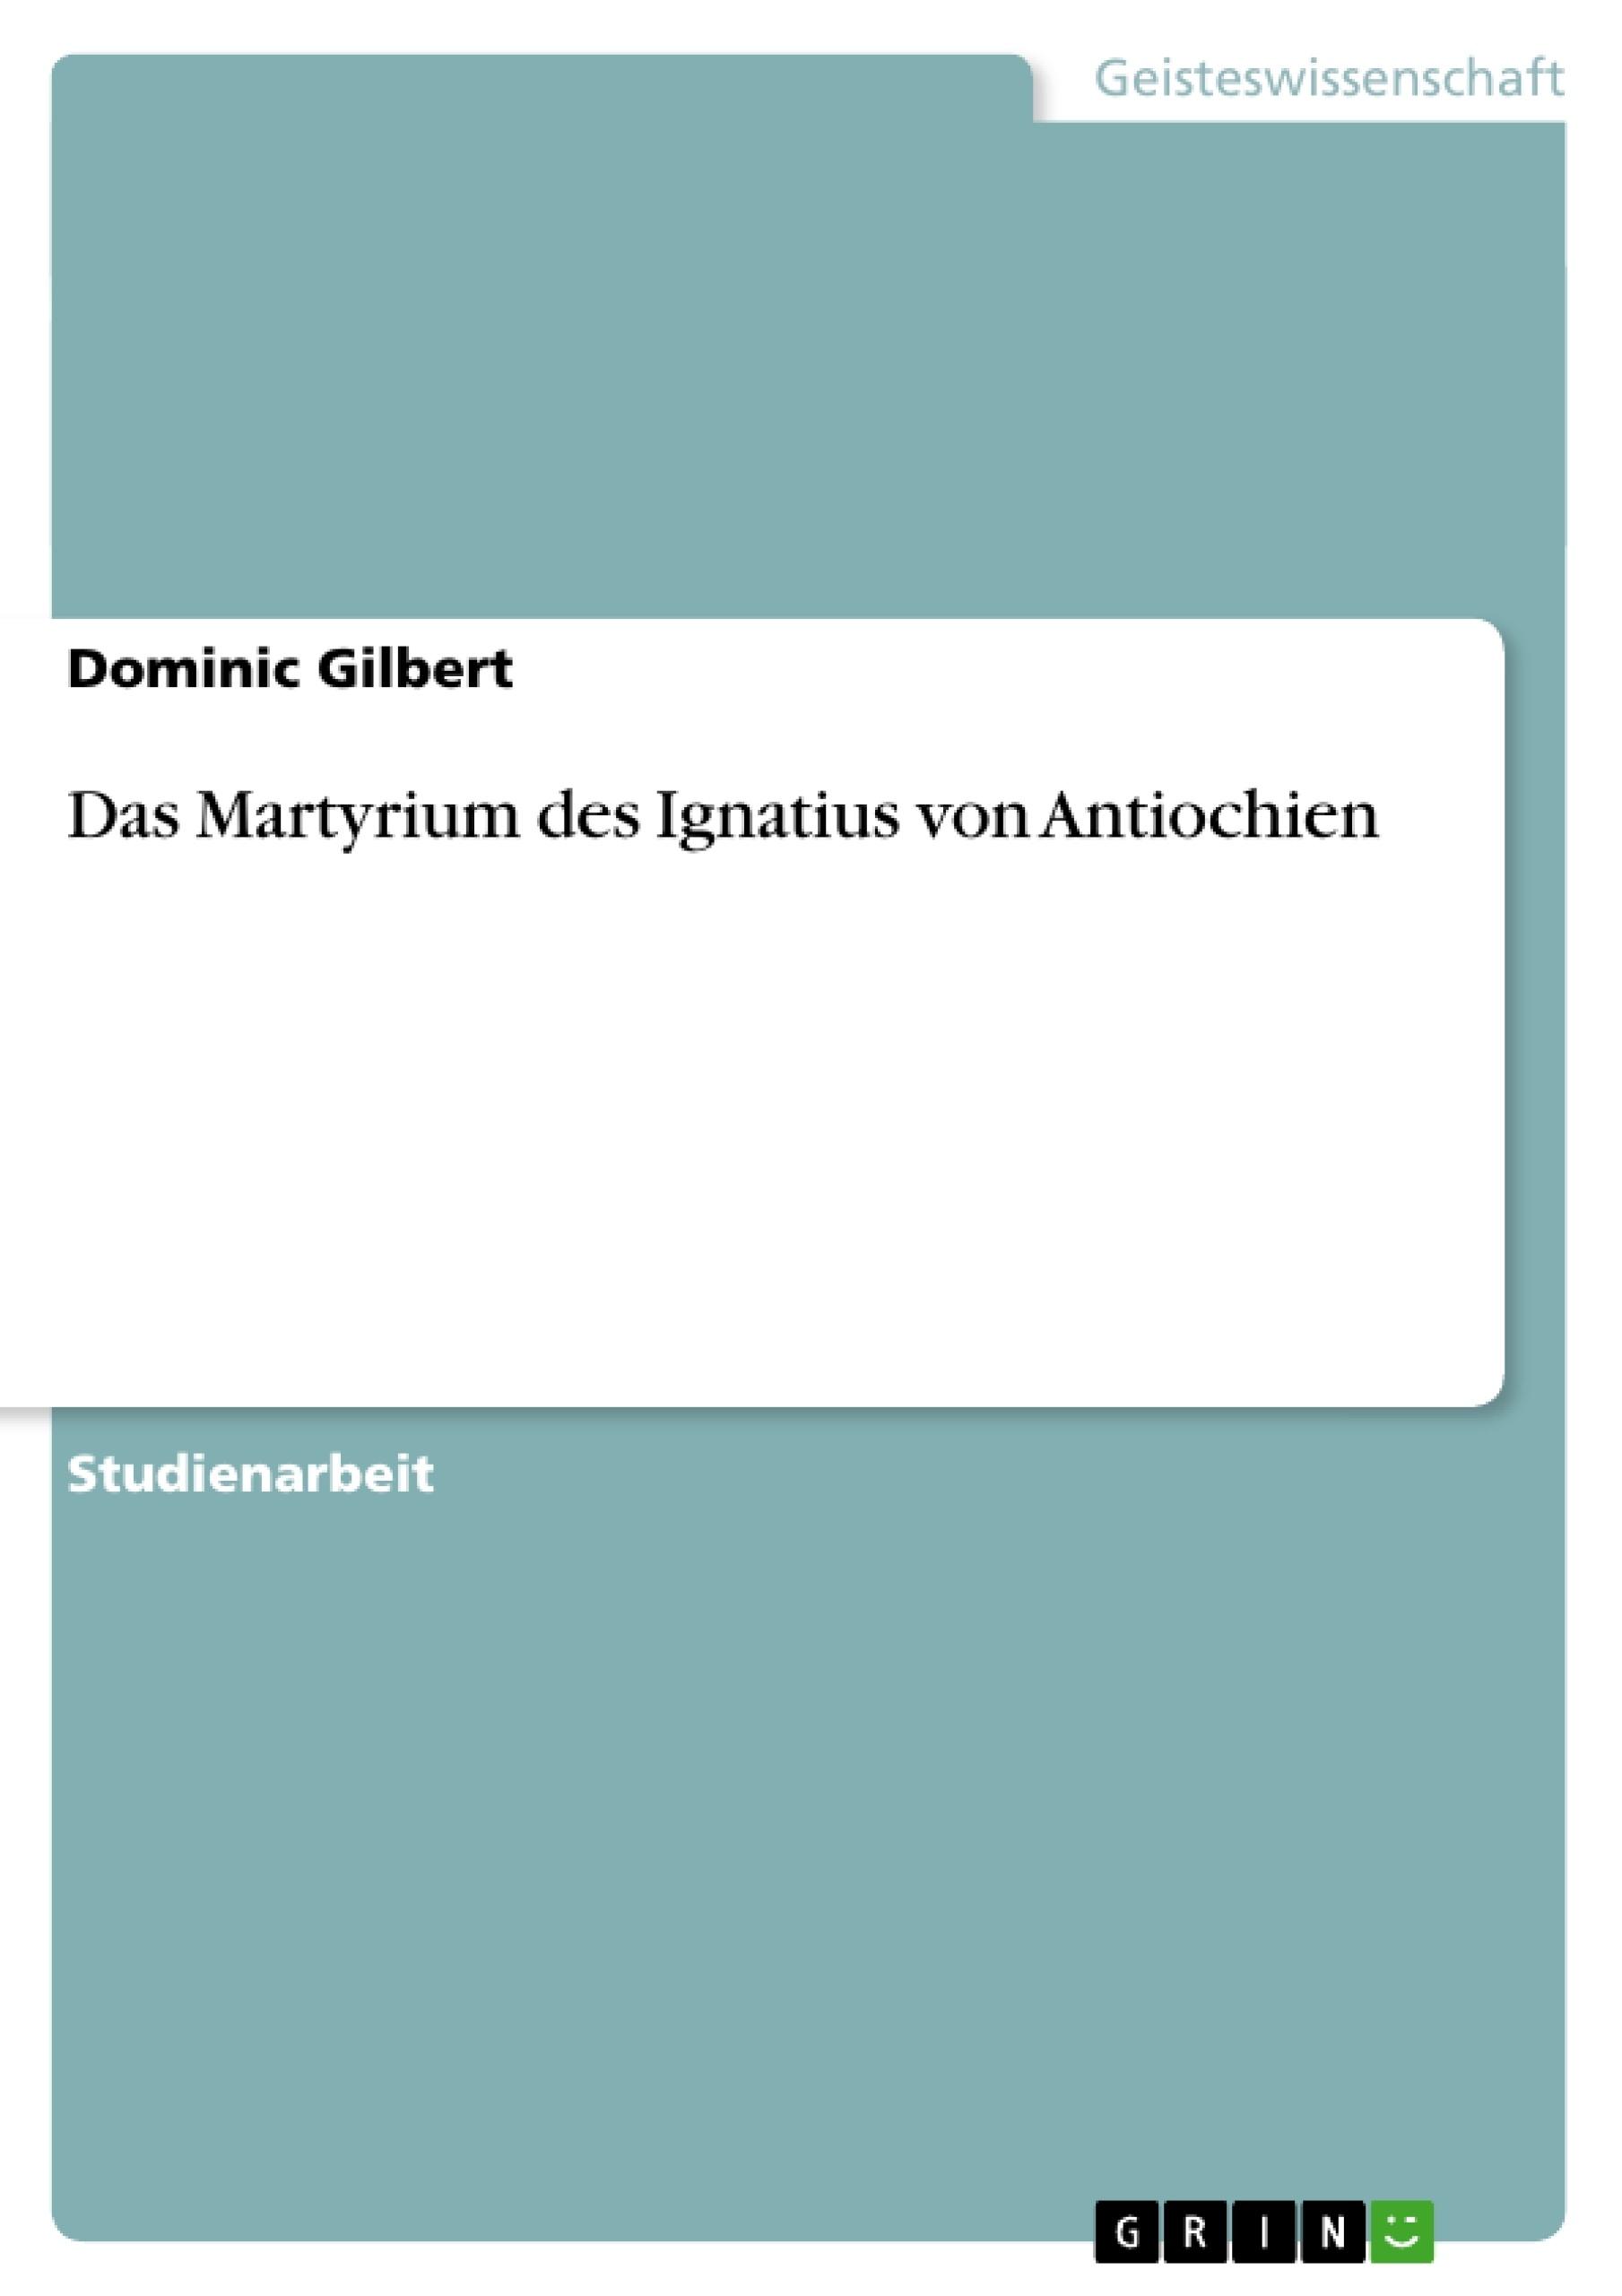 Titel: Das Martyrium des Ignatius von Antiochien